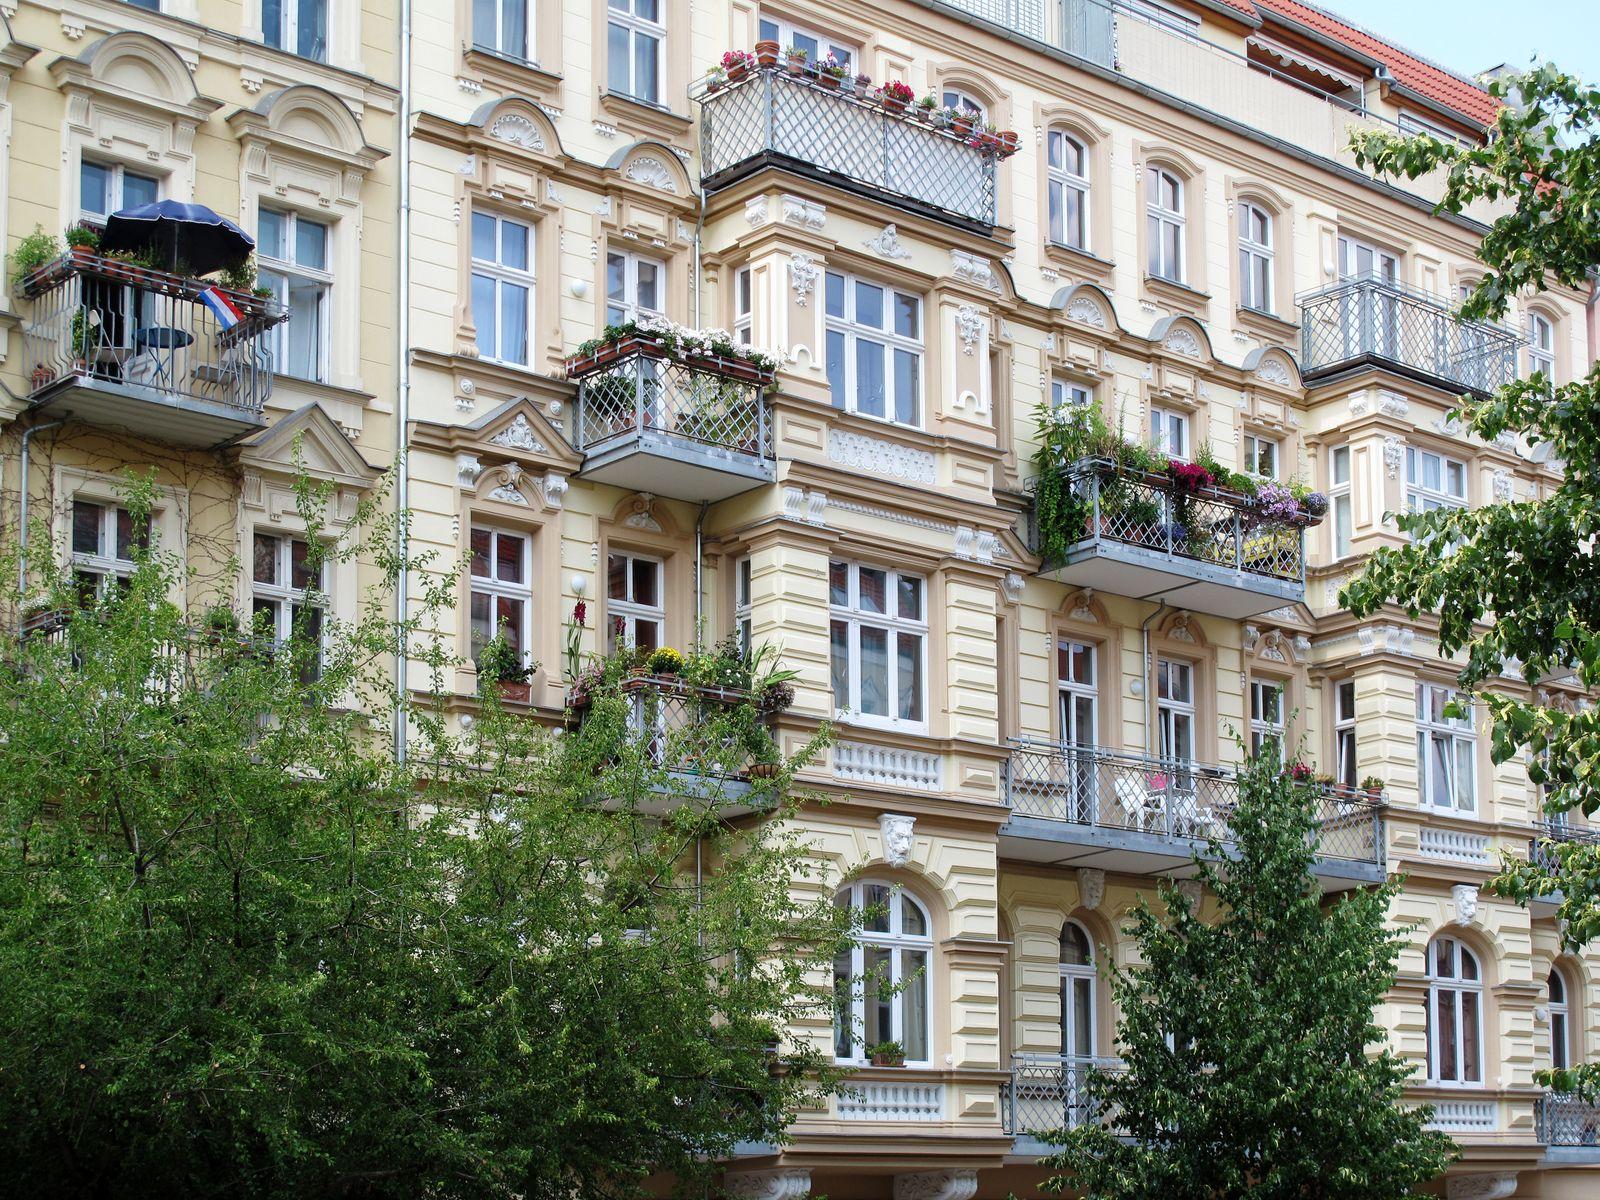 Facades of pre-war residential buildings in the district of Prenzlauer Berg, Berlin, Germany